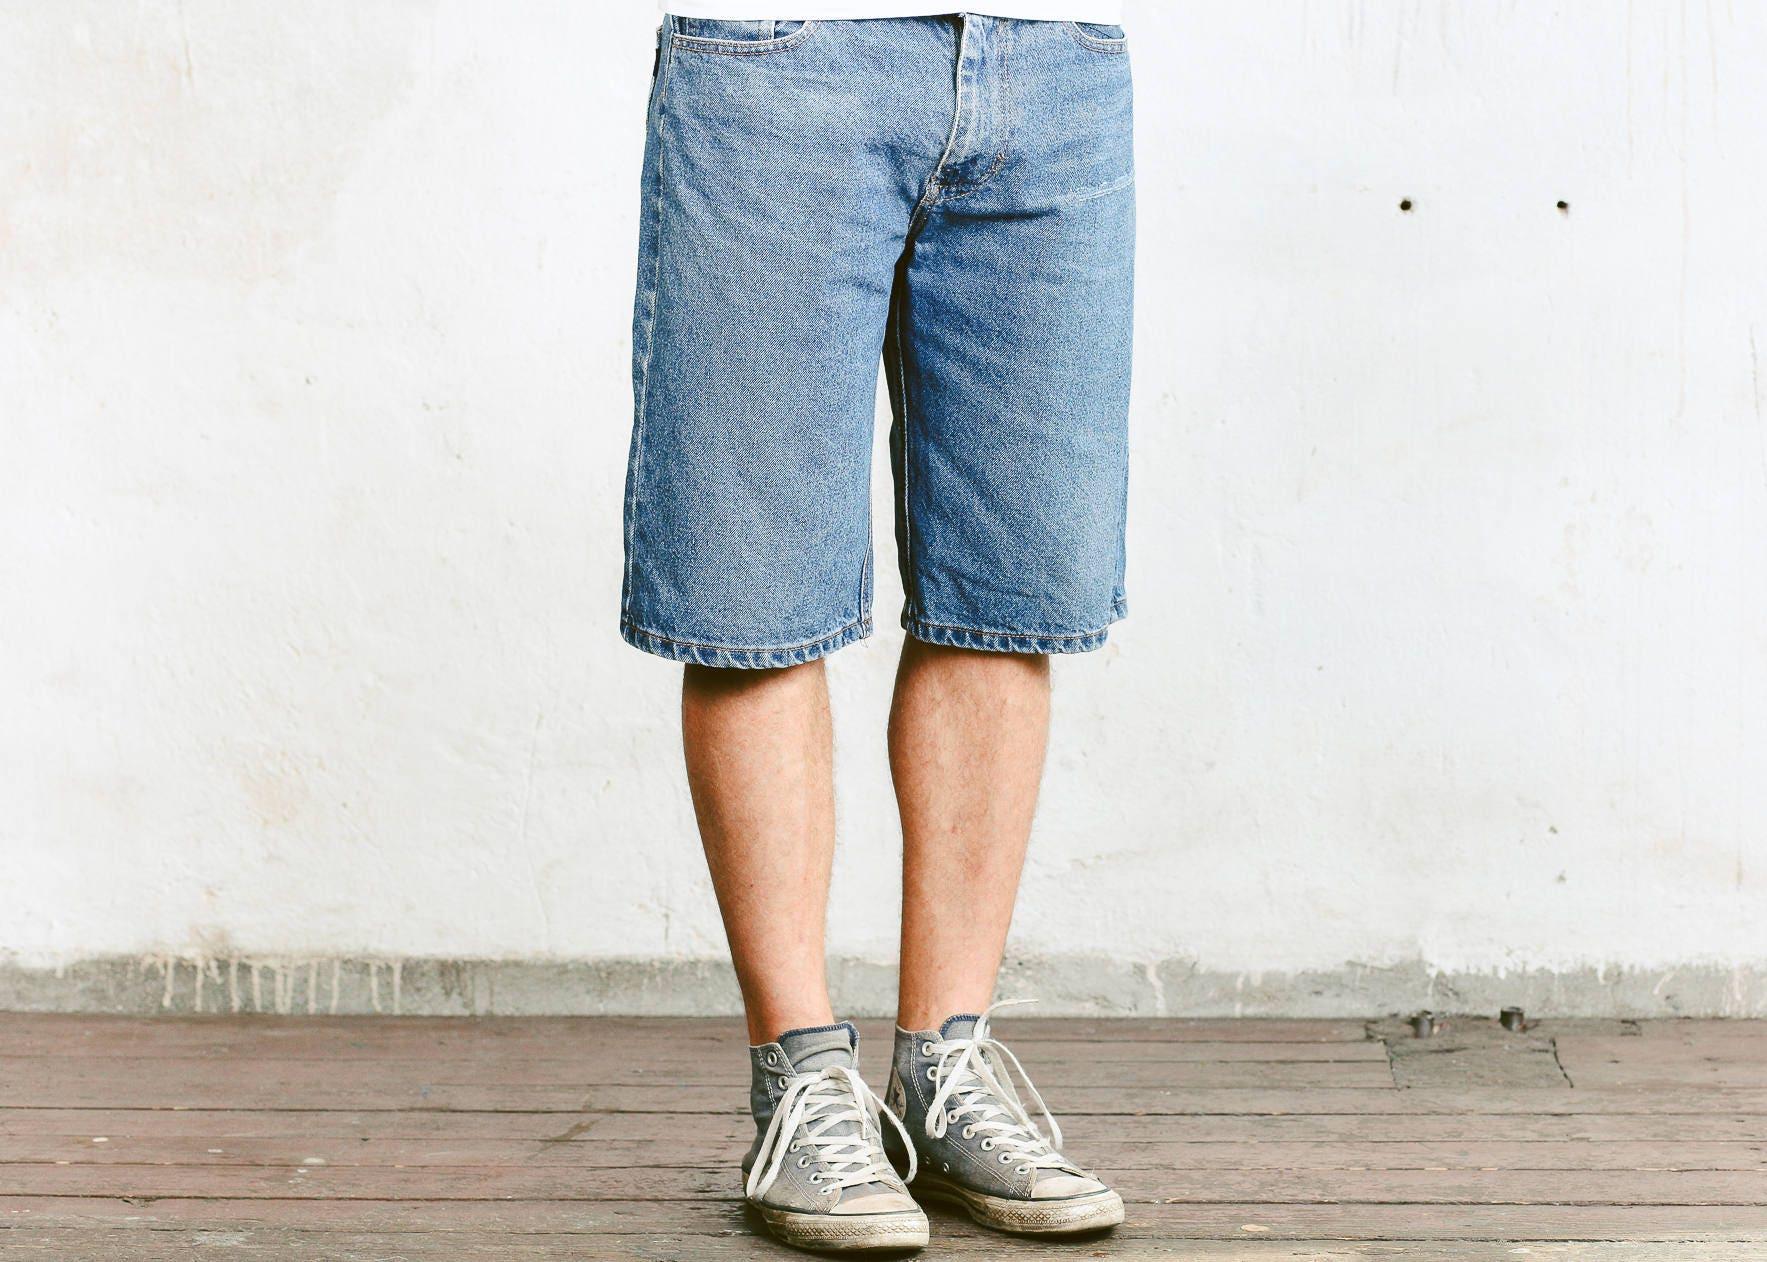 cf2f54292 Tommy Hilfiger Shorts . Mens Vintage Jean Shorts Classic 90s | Etsy